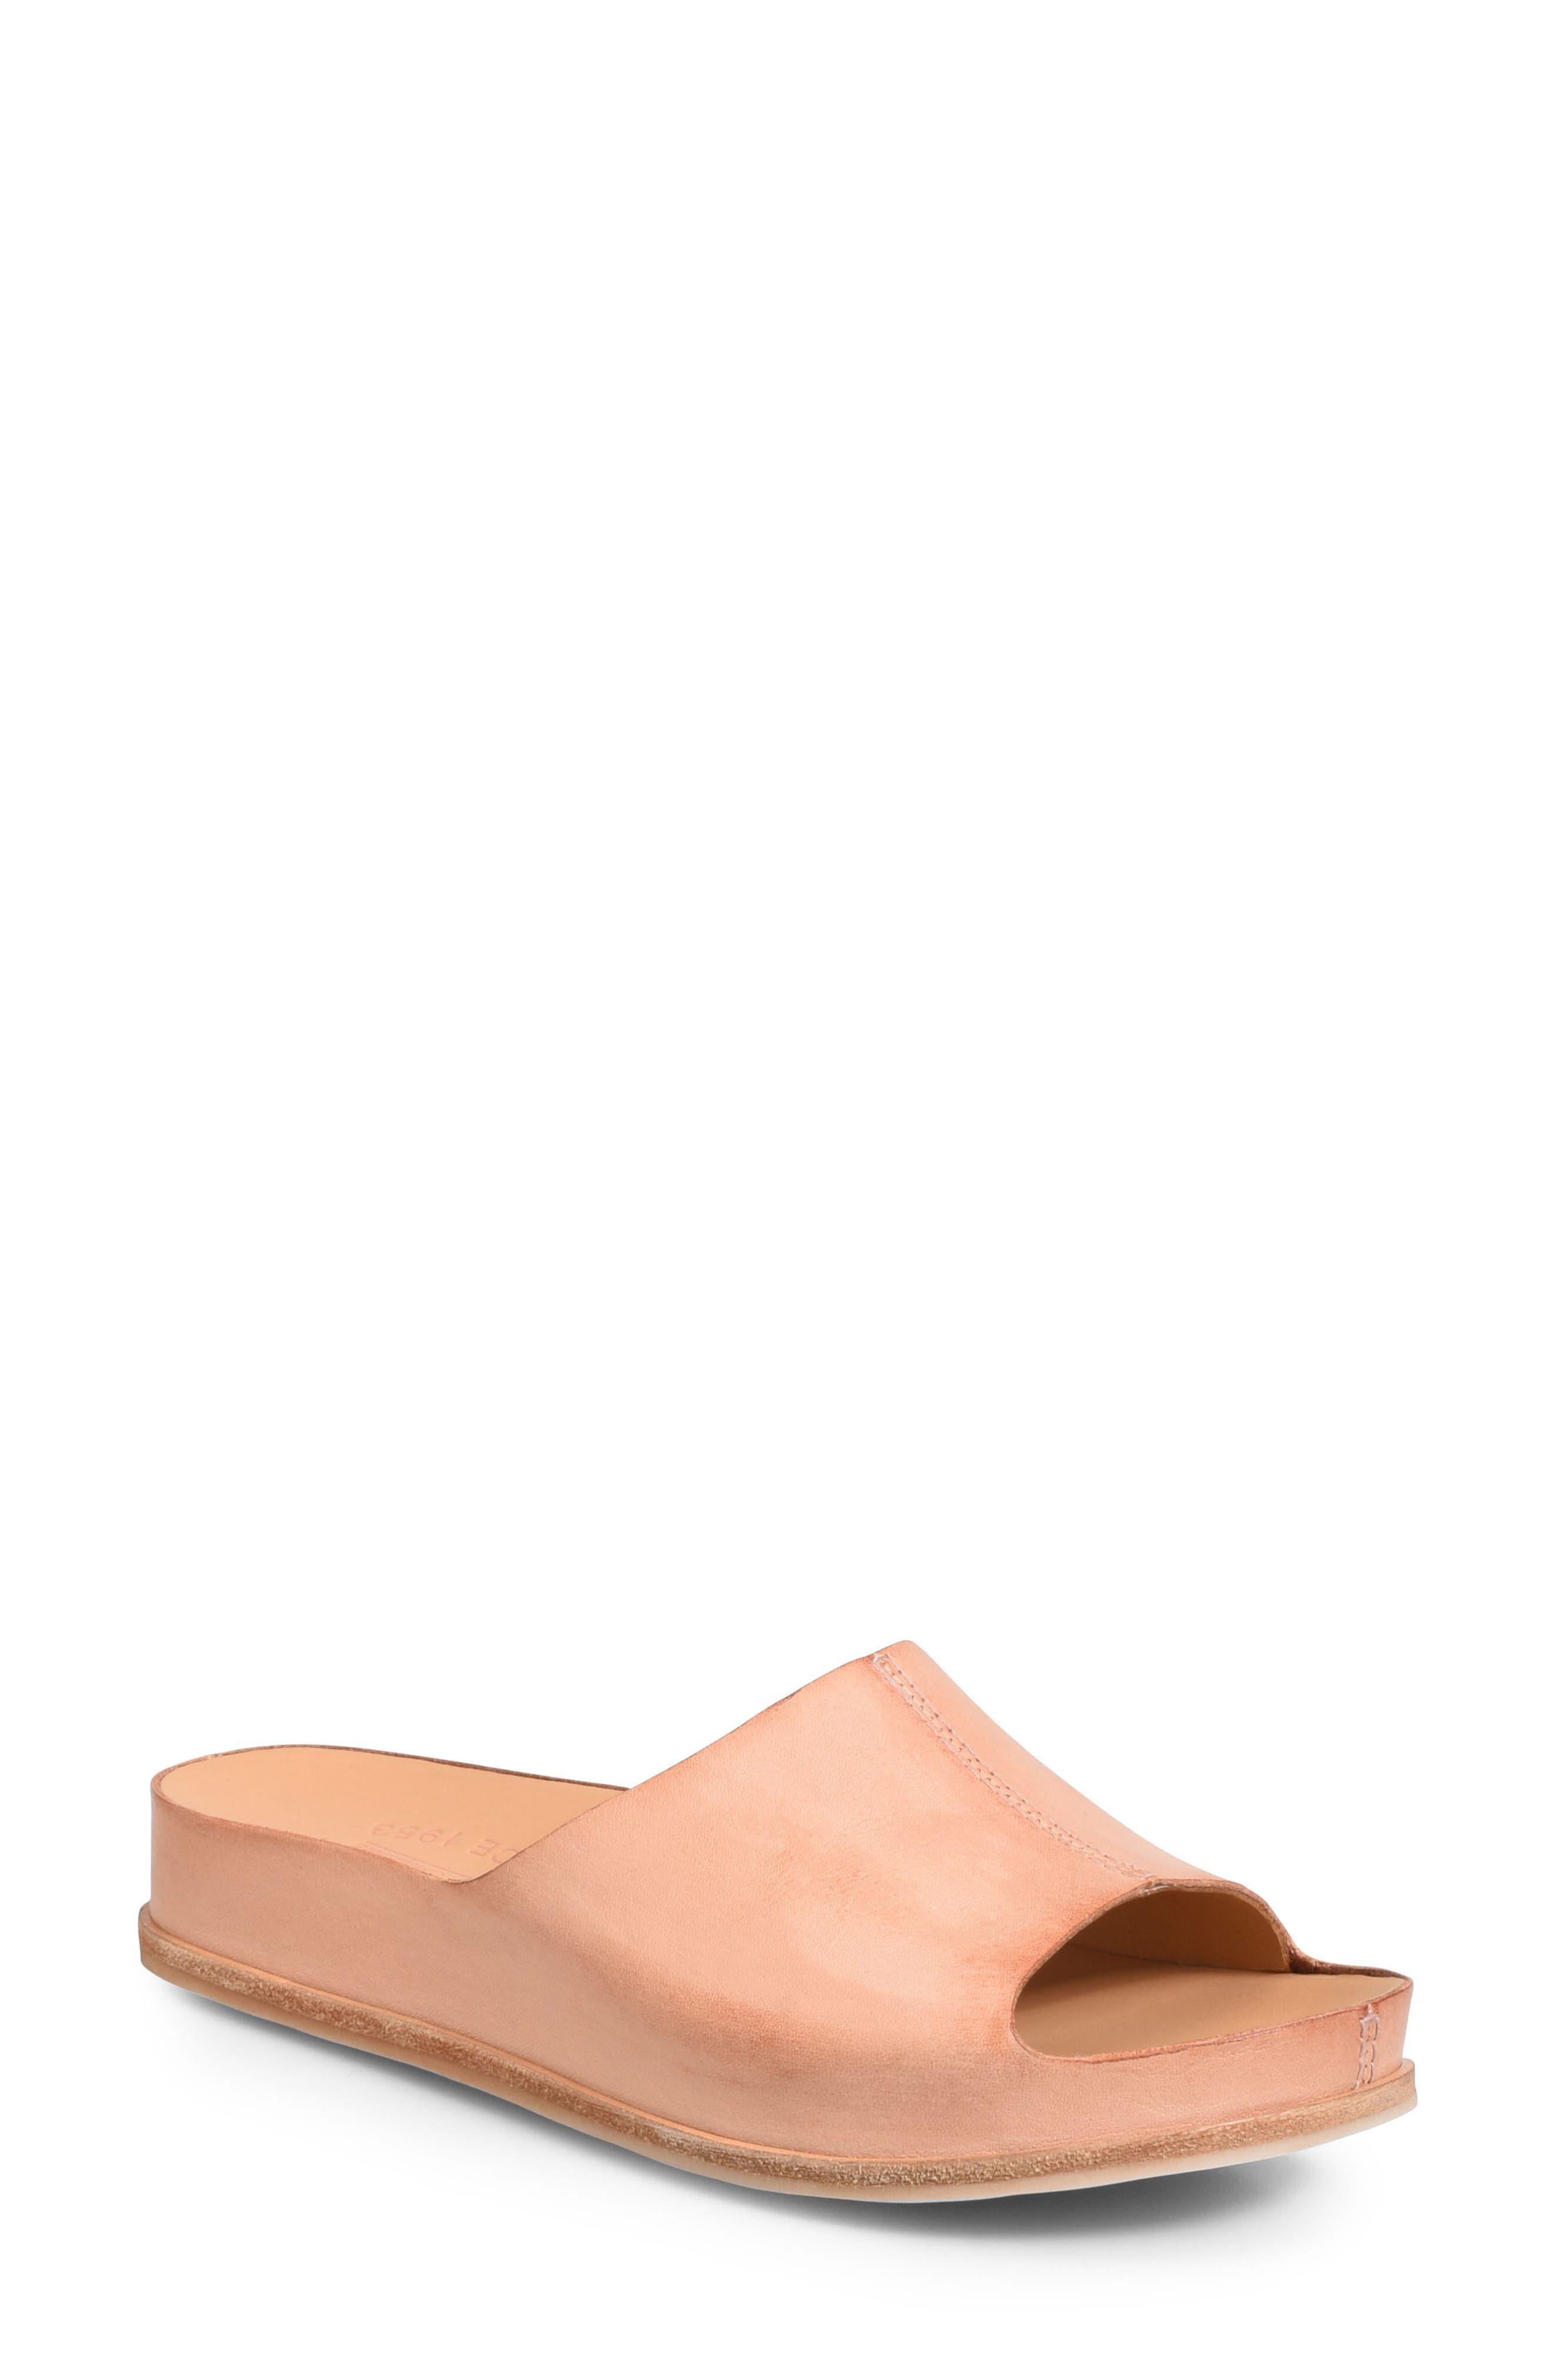 'Tutsi' Slide Sandal,                         Main,                         color, Blush Leather